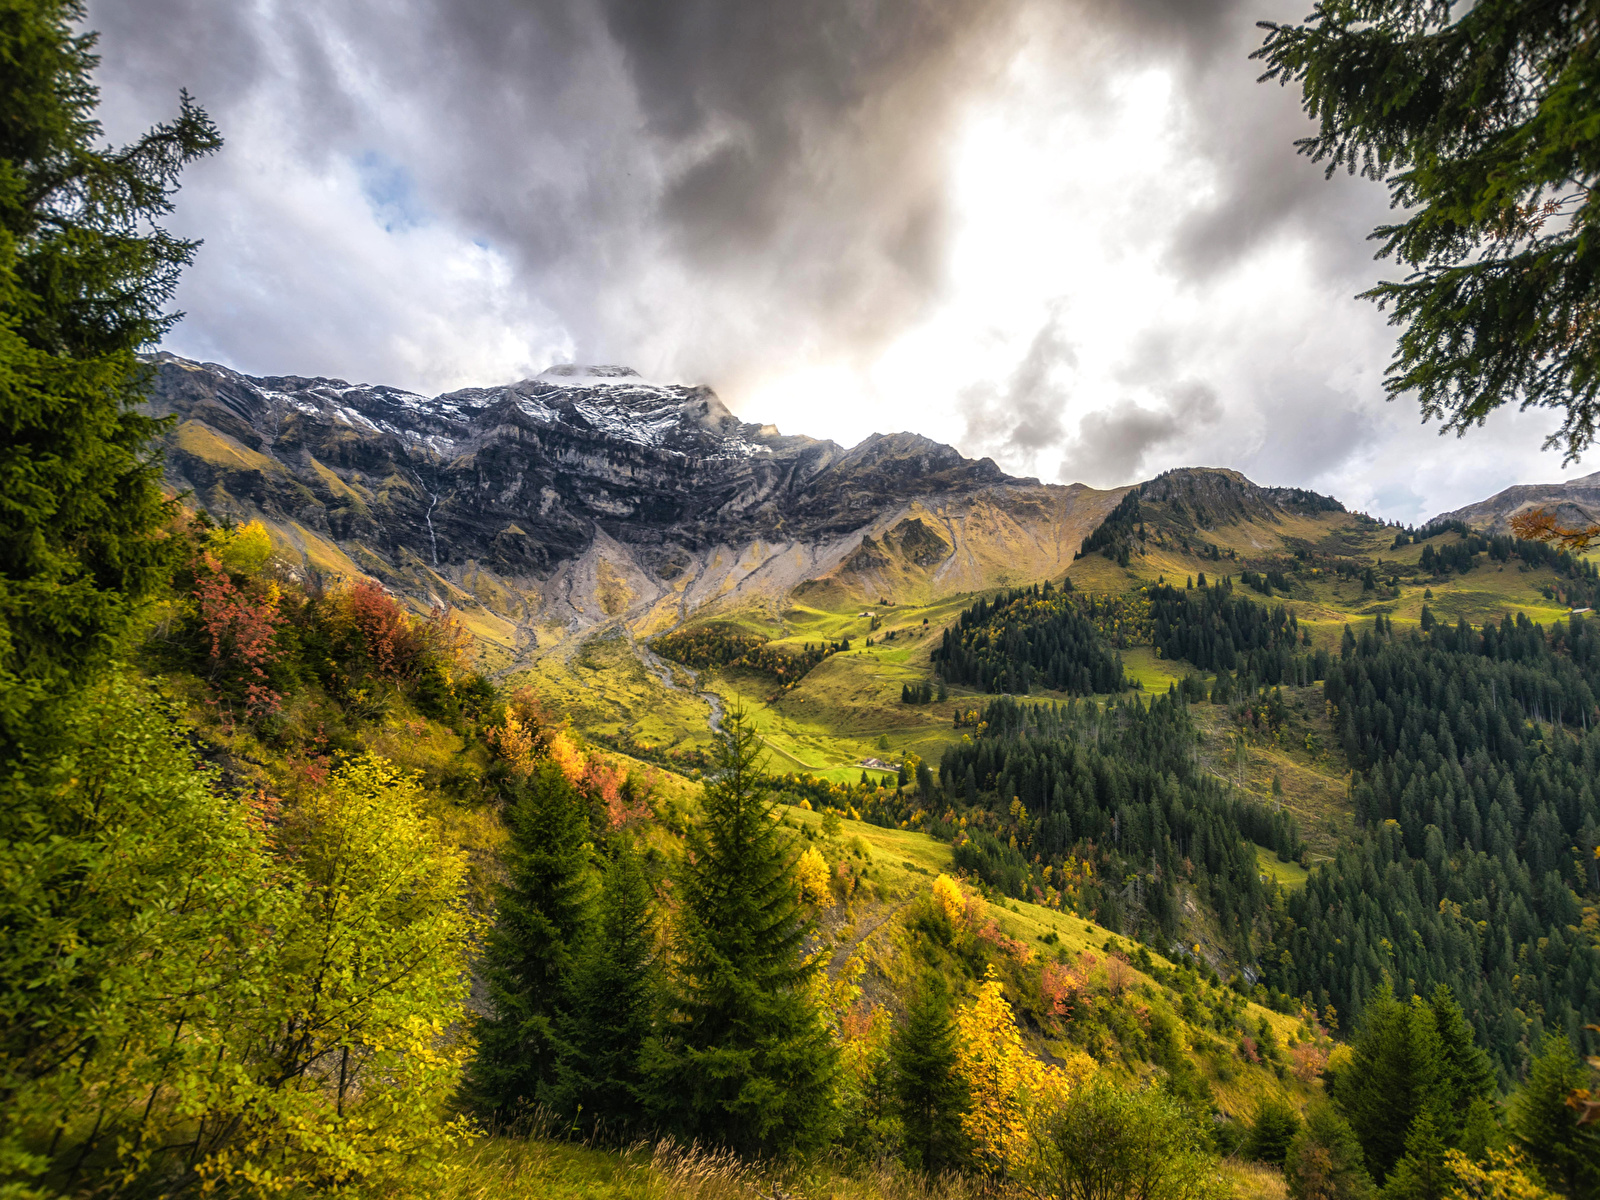 Images Switzerland Interlaken Oberhasli Nature Spruce 1600x1200 1600x1200